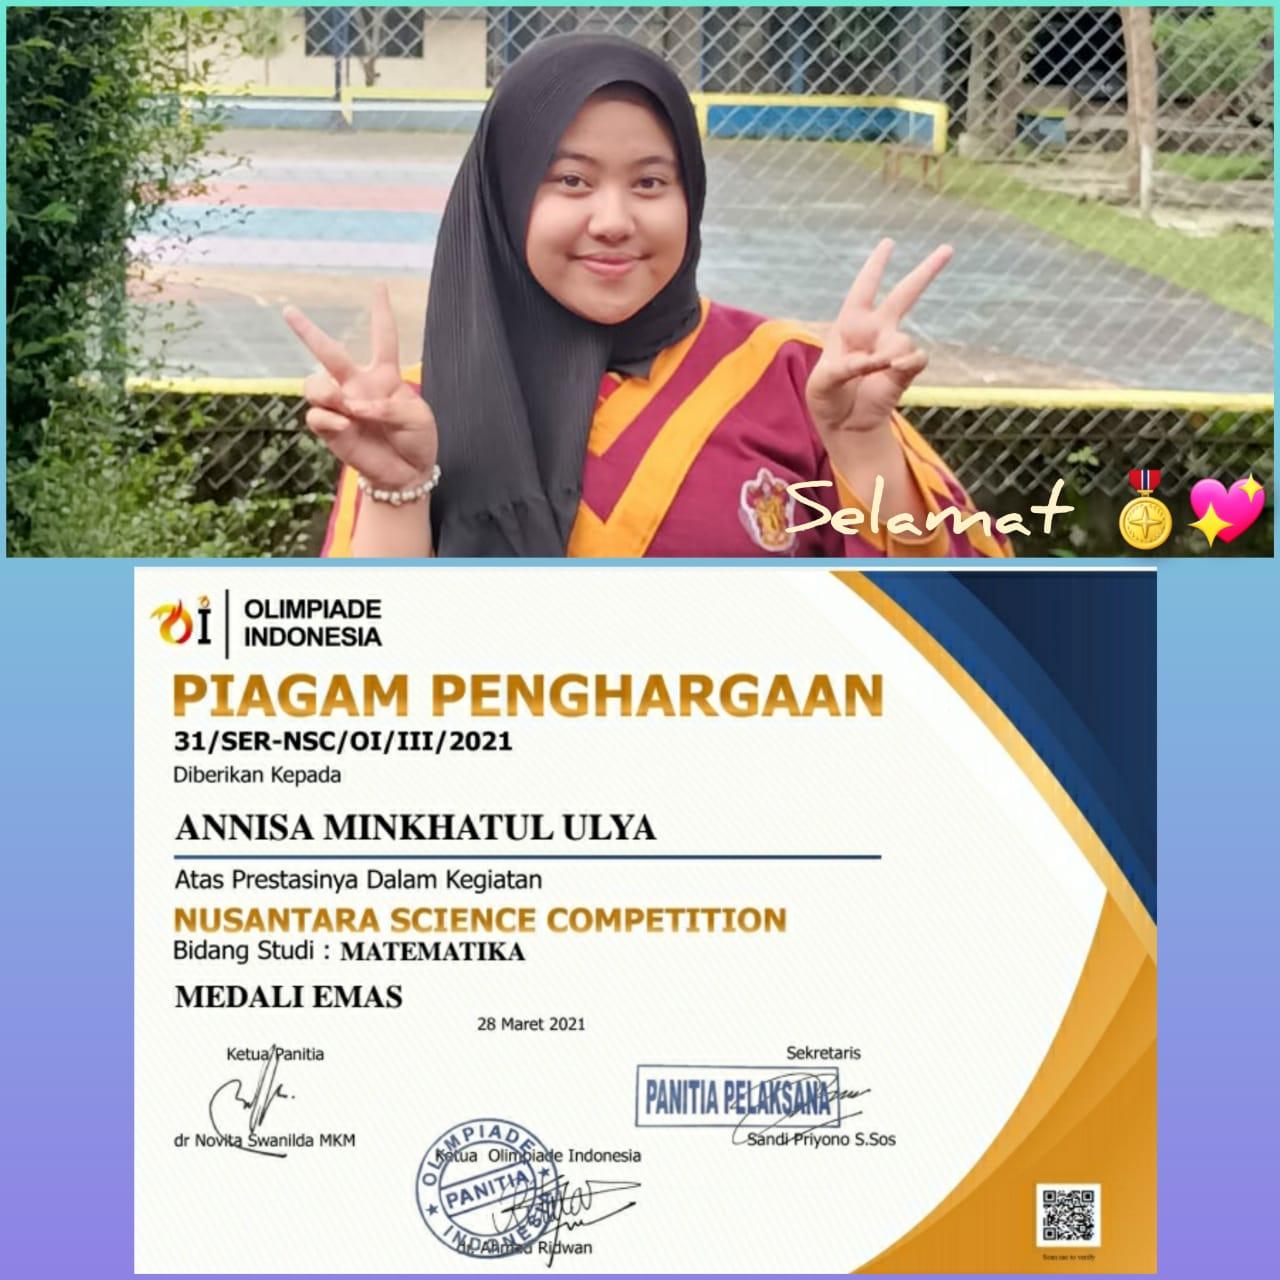 Annisa Mikhatul Ulya: Medali Emas Nusantara Science Competiton Bidang Matematika